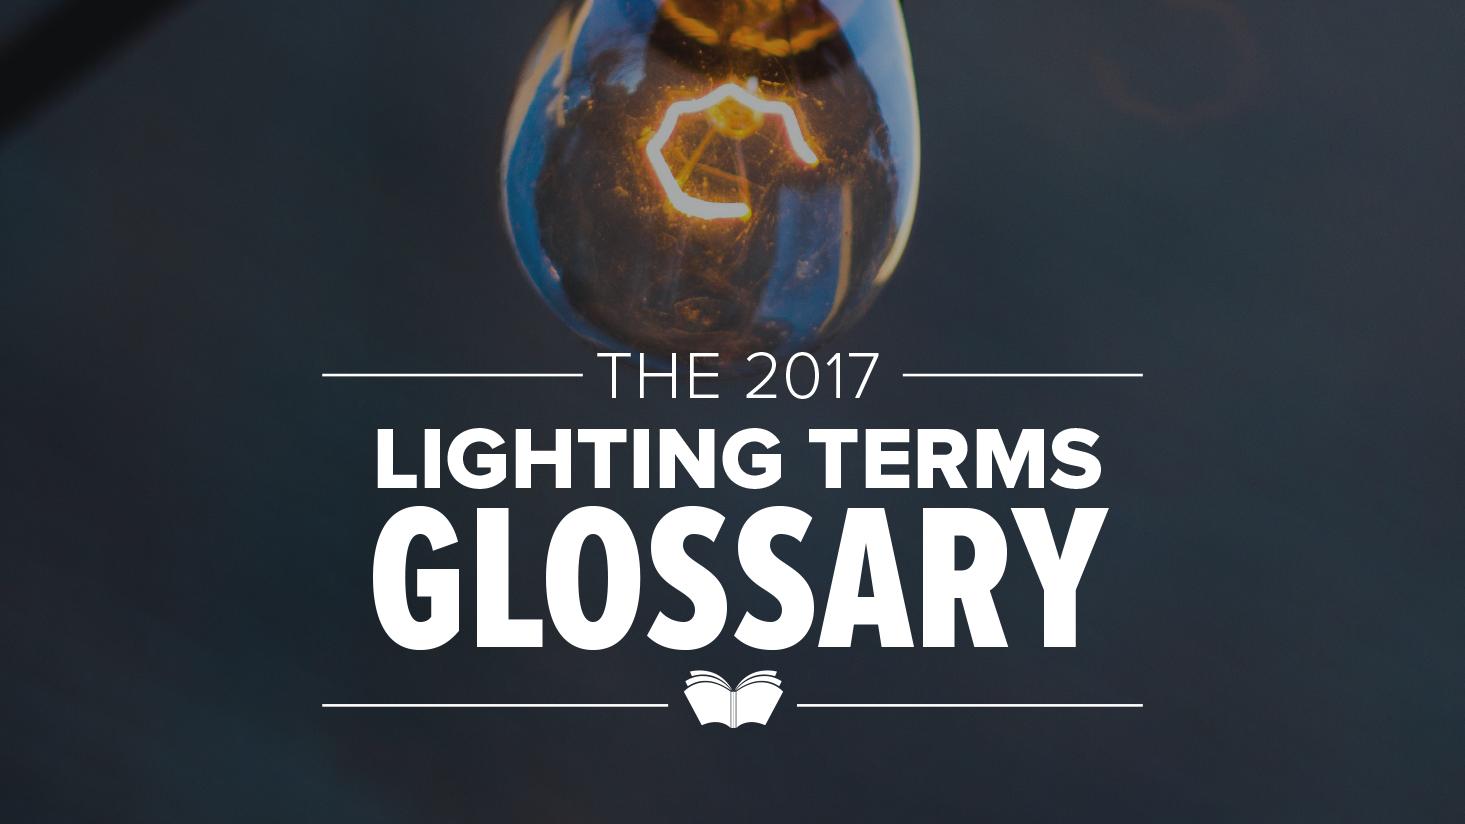 Lighting Terms Glossary: 2017 Edition